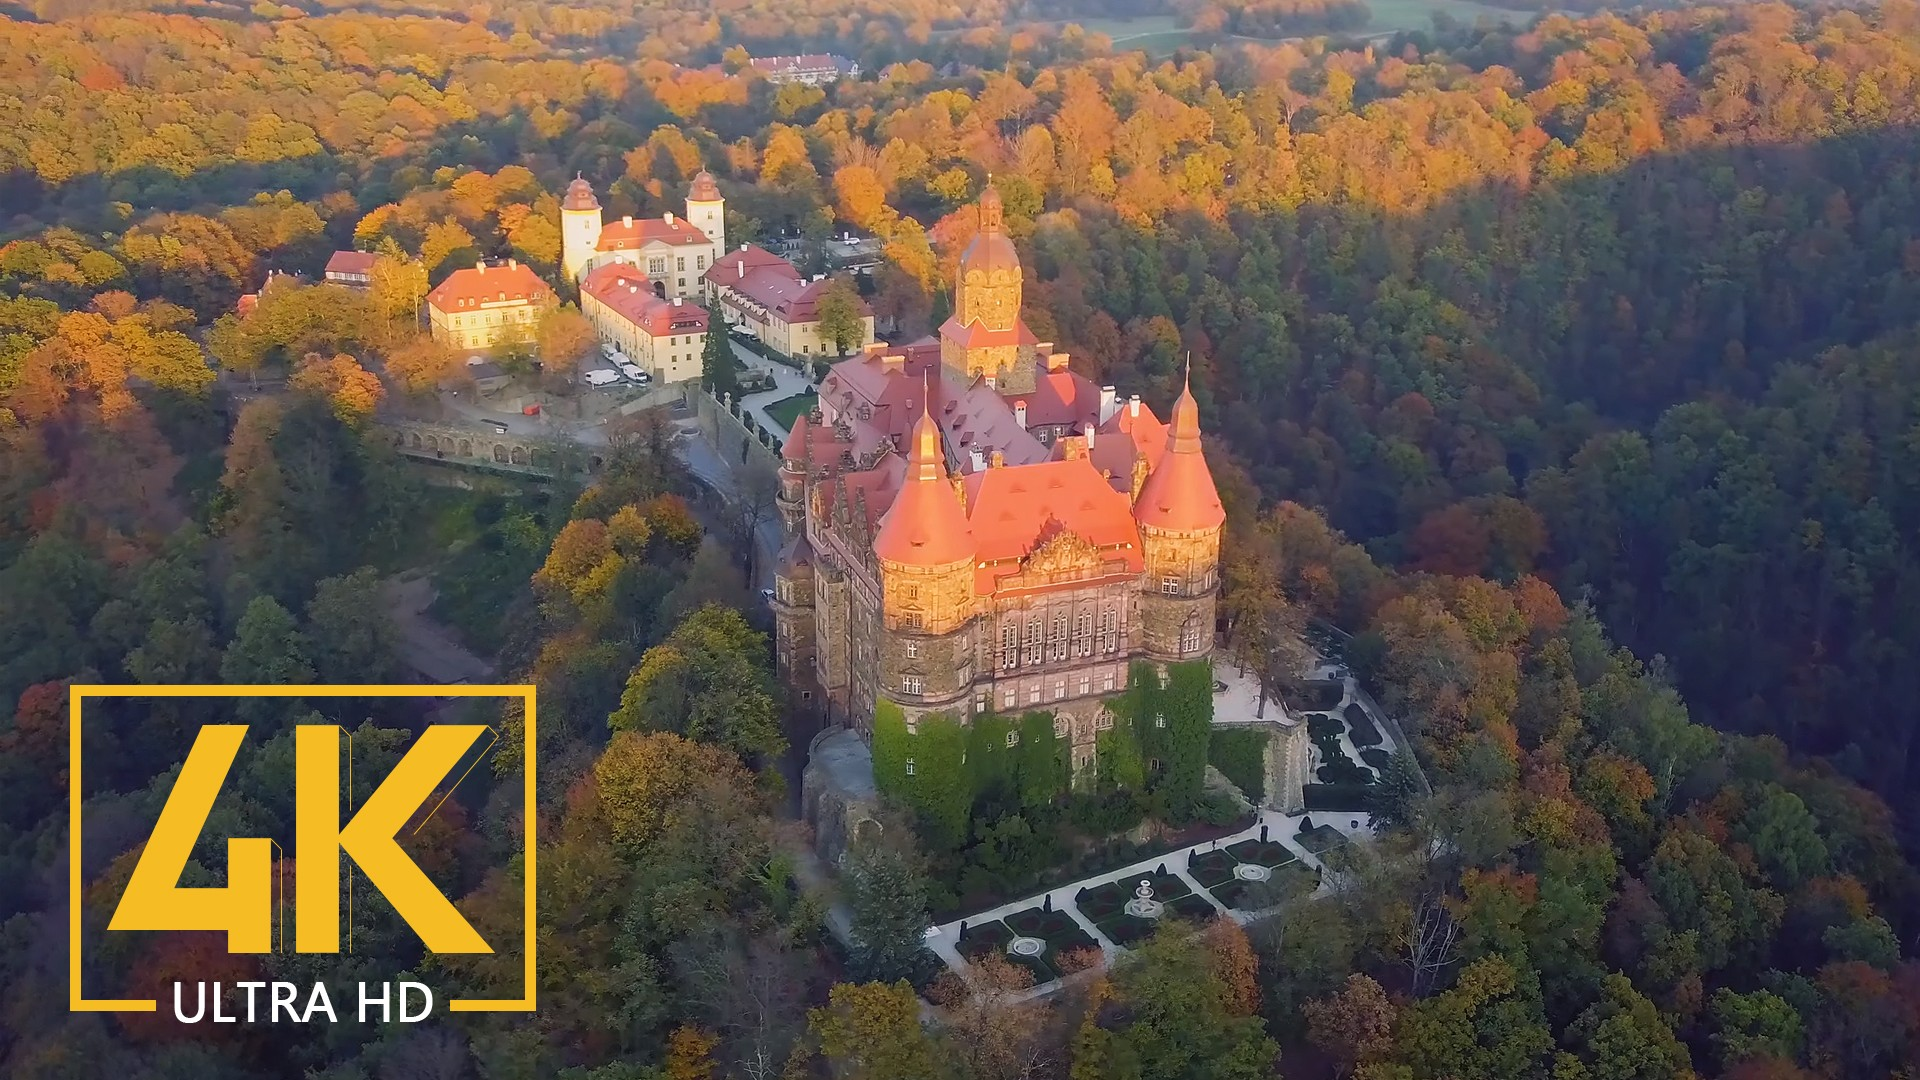 Polish Castles in 4K (Ultra HD) – Short Film Preview